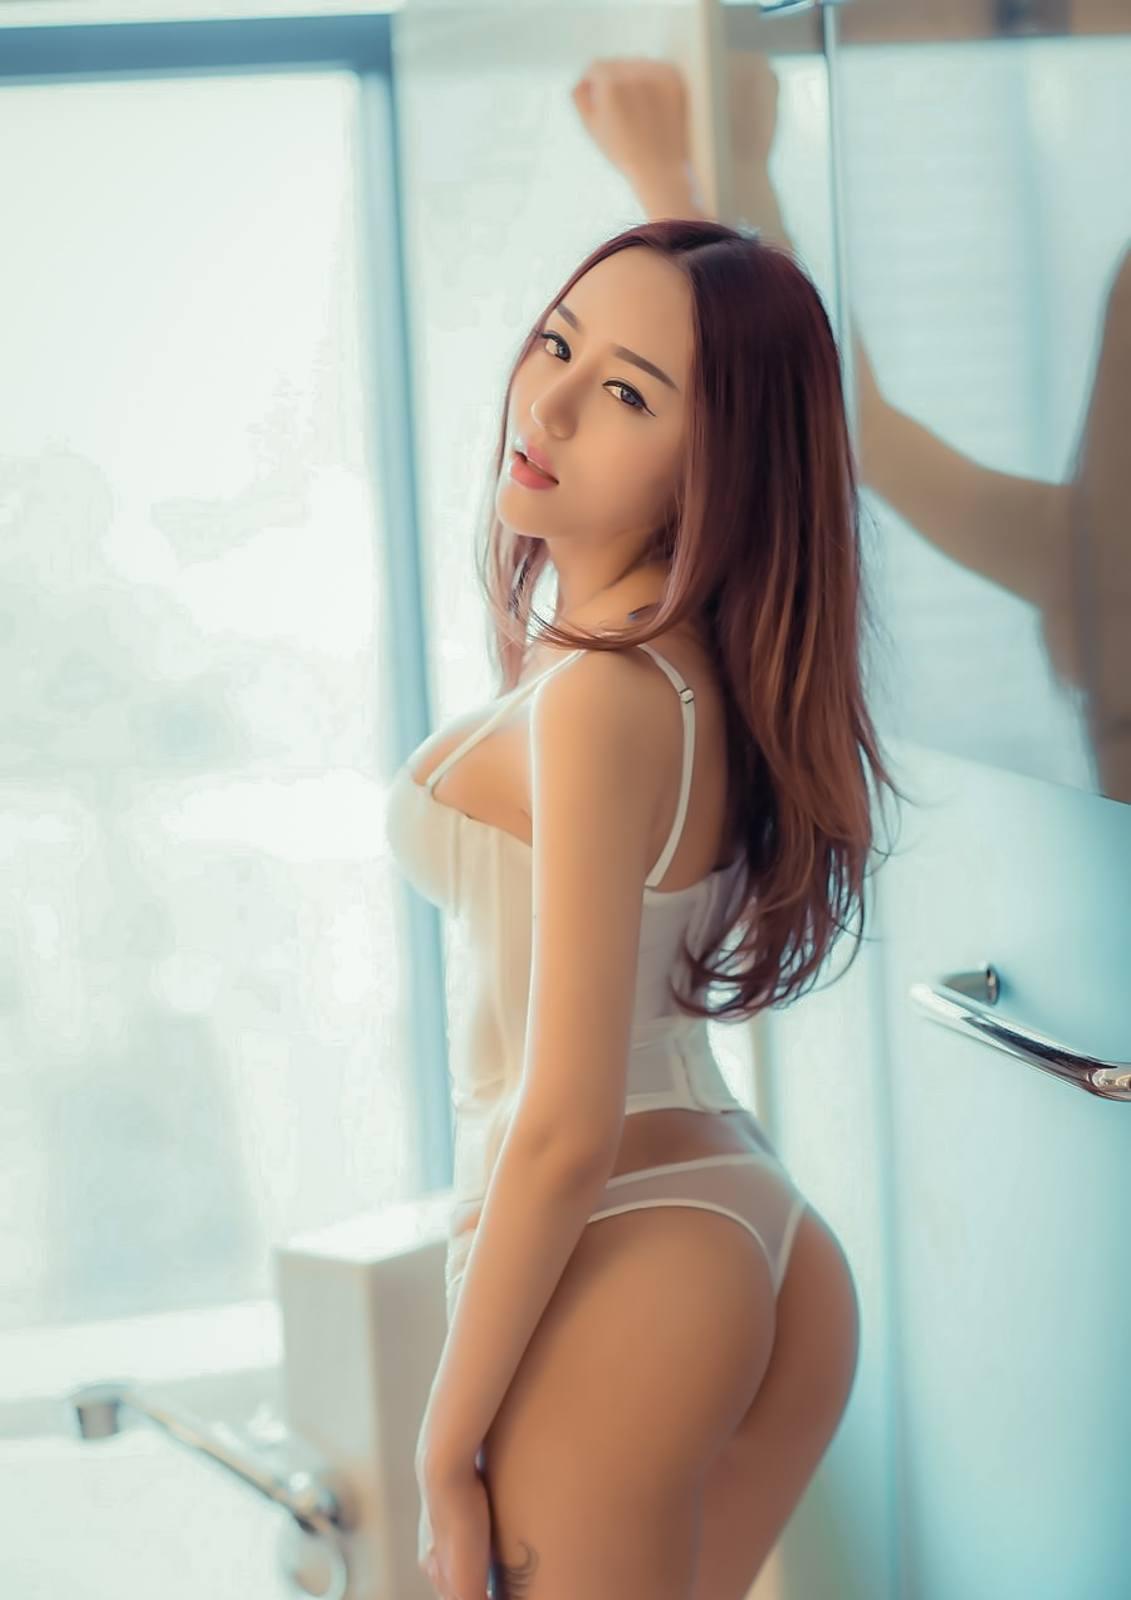 Mi%2BYeon%2BLee%2B%25E6%259D%258E%25E7%25BE%258E%25E5%25A6%258D%2B %2BBubbles Covered%2BNude%2BOutdoors%2B %2B010 - Korean Nude - Big Albom Remain #A-korean girl